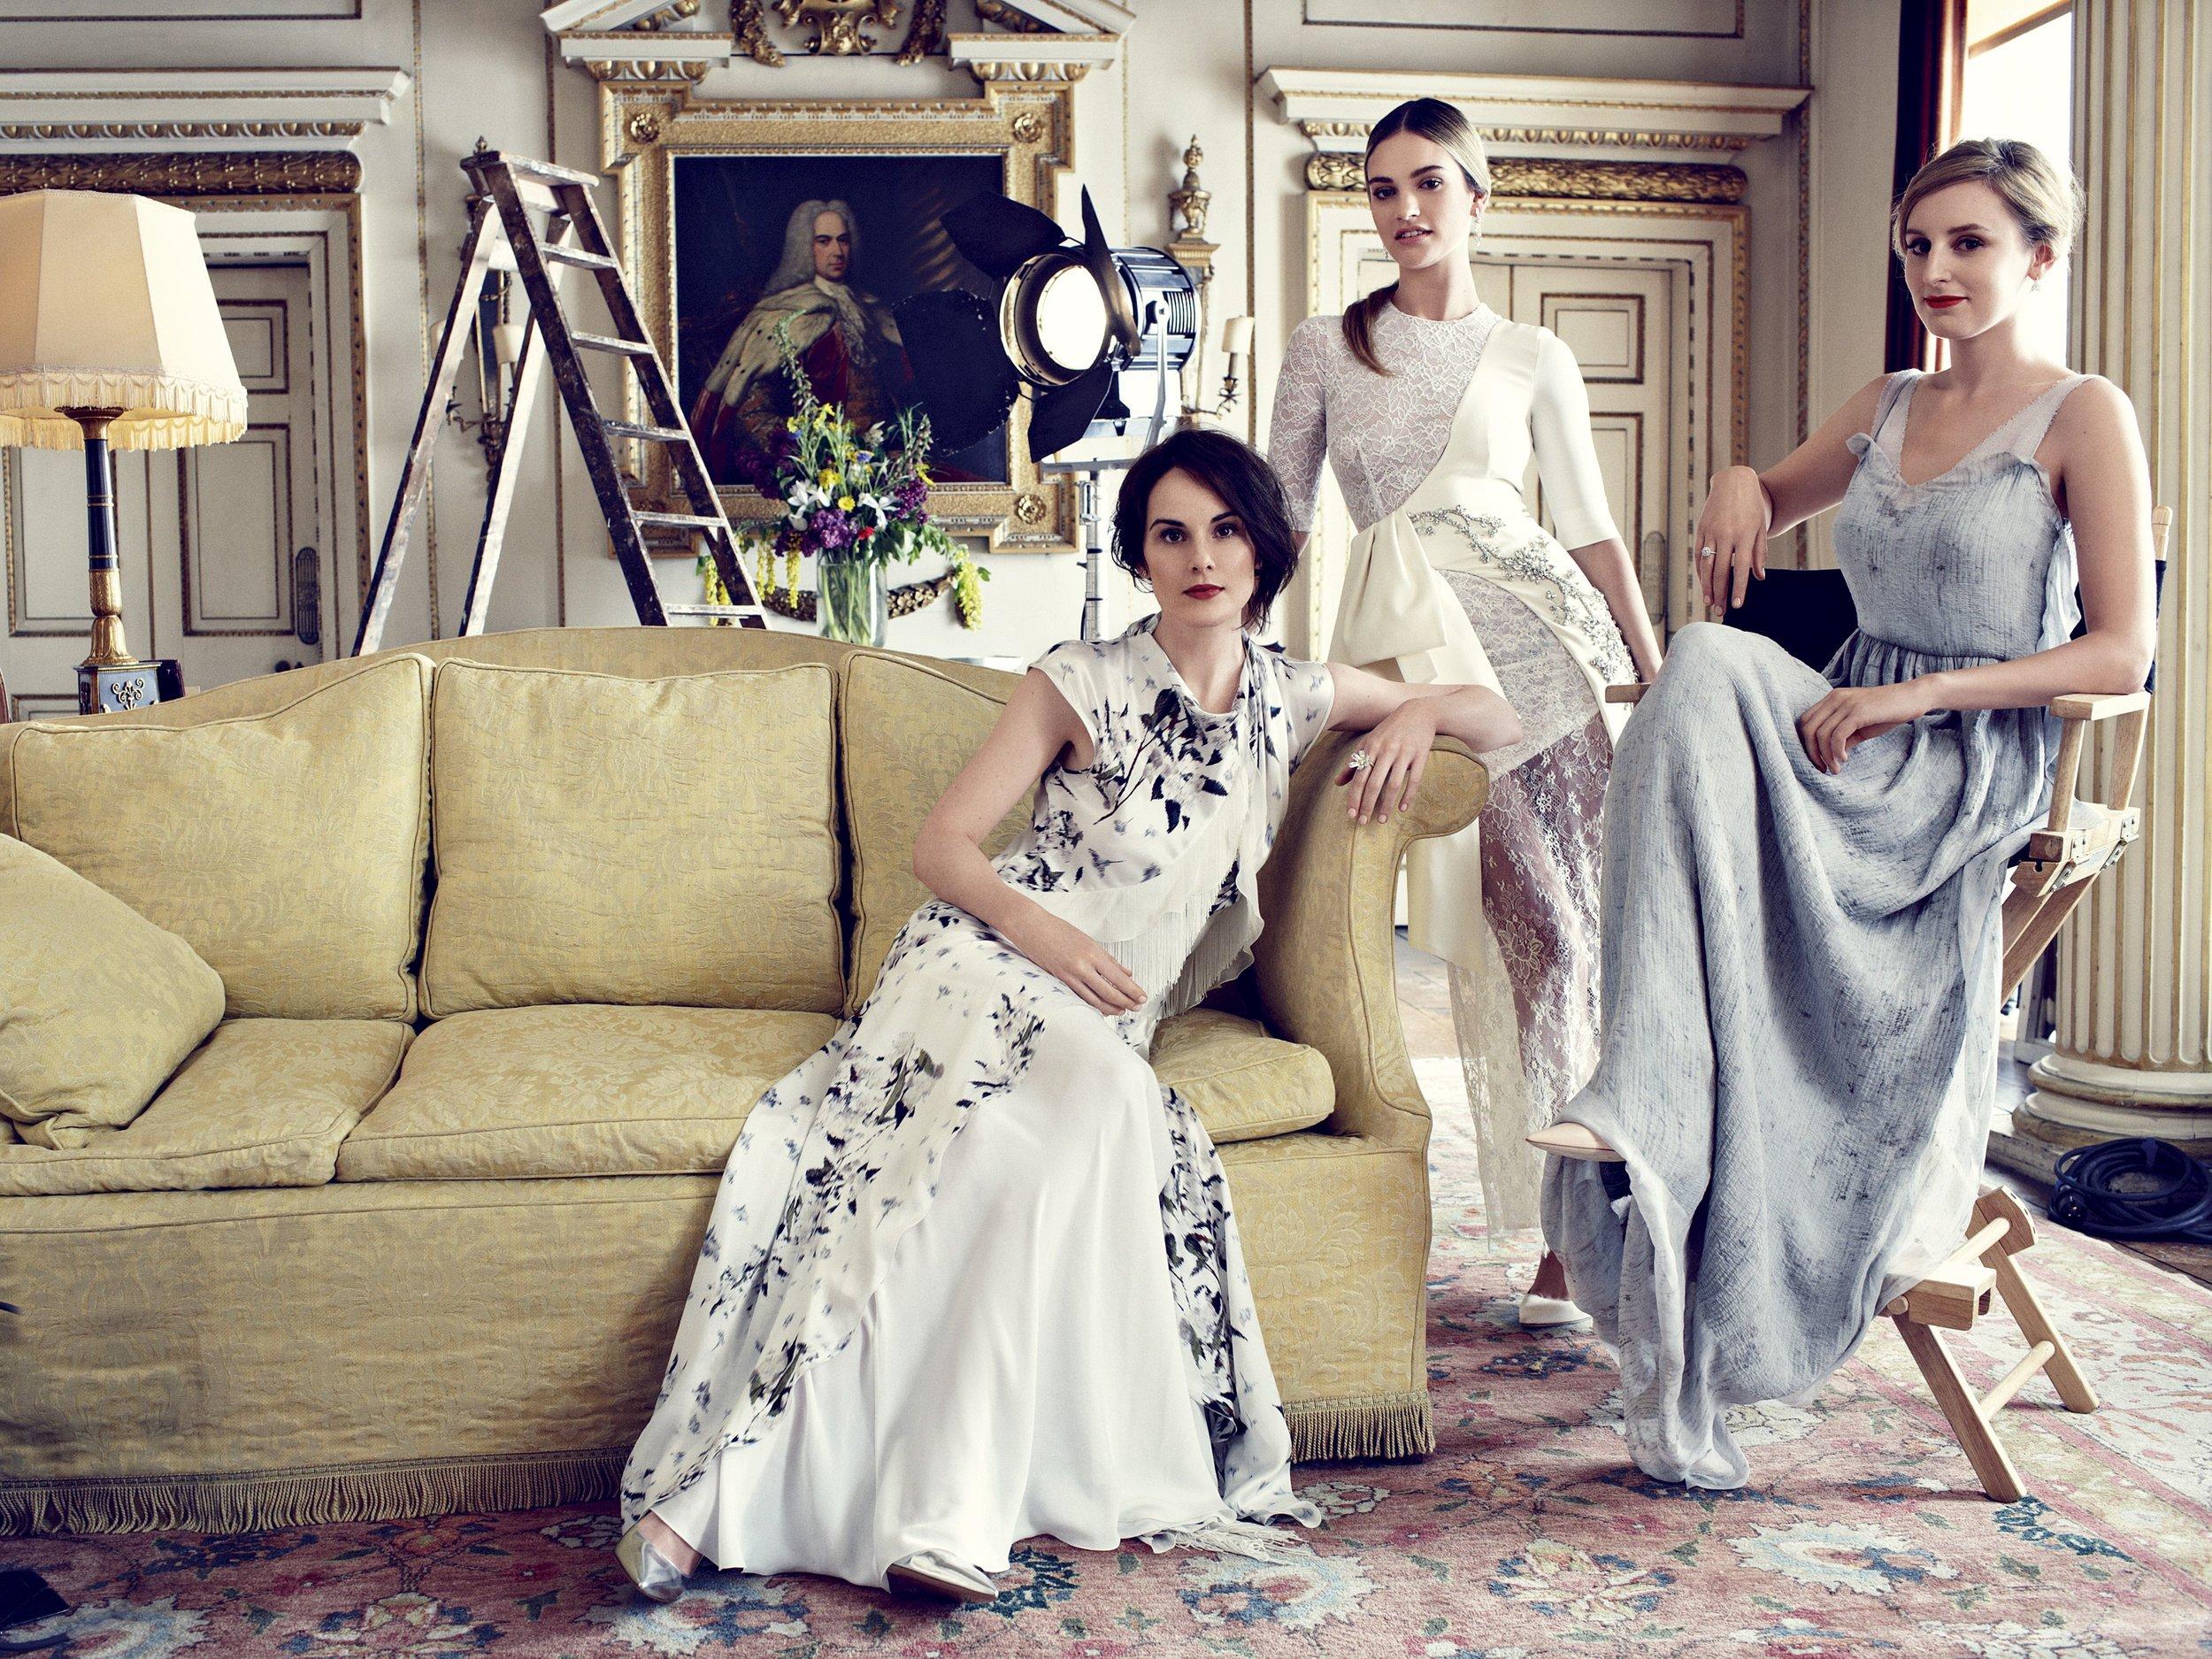 Alexi Lubormirski for Harper's Bazaar